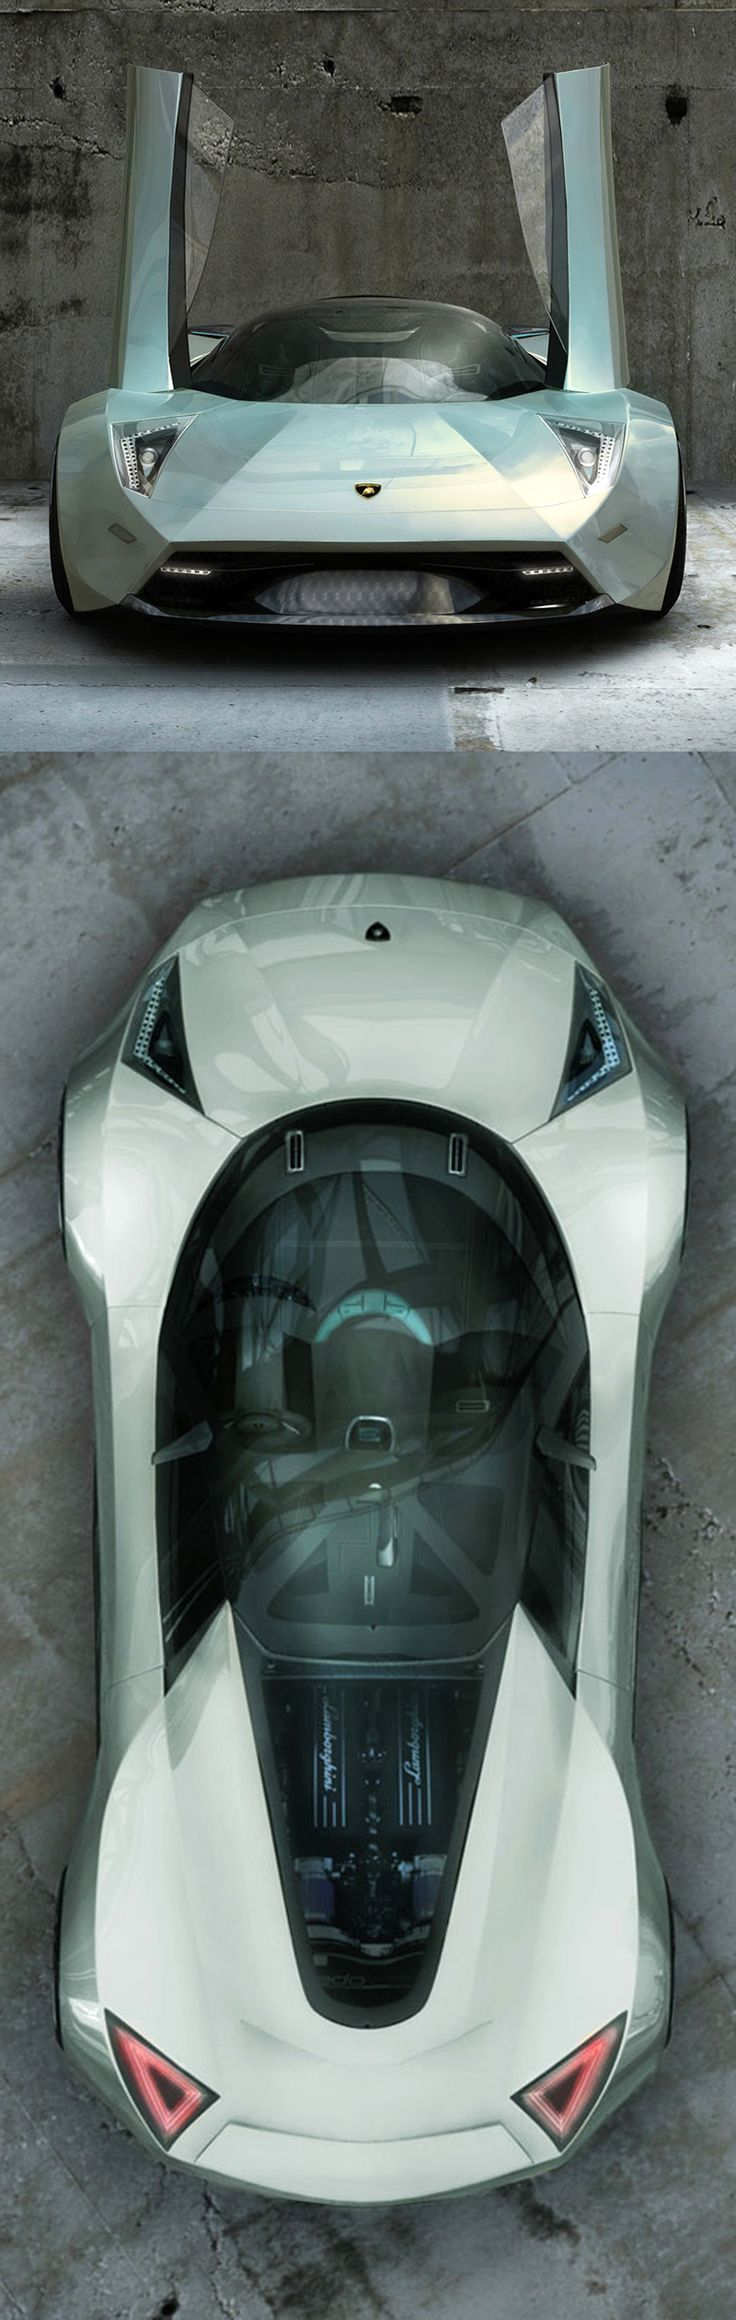 ♂ Lamborghini Insecta Concept car silver from http://www.carbodydesign.com/gallery/2009/03/02-lamborghini-insecta-concept/12/